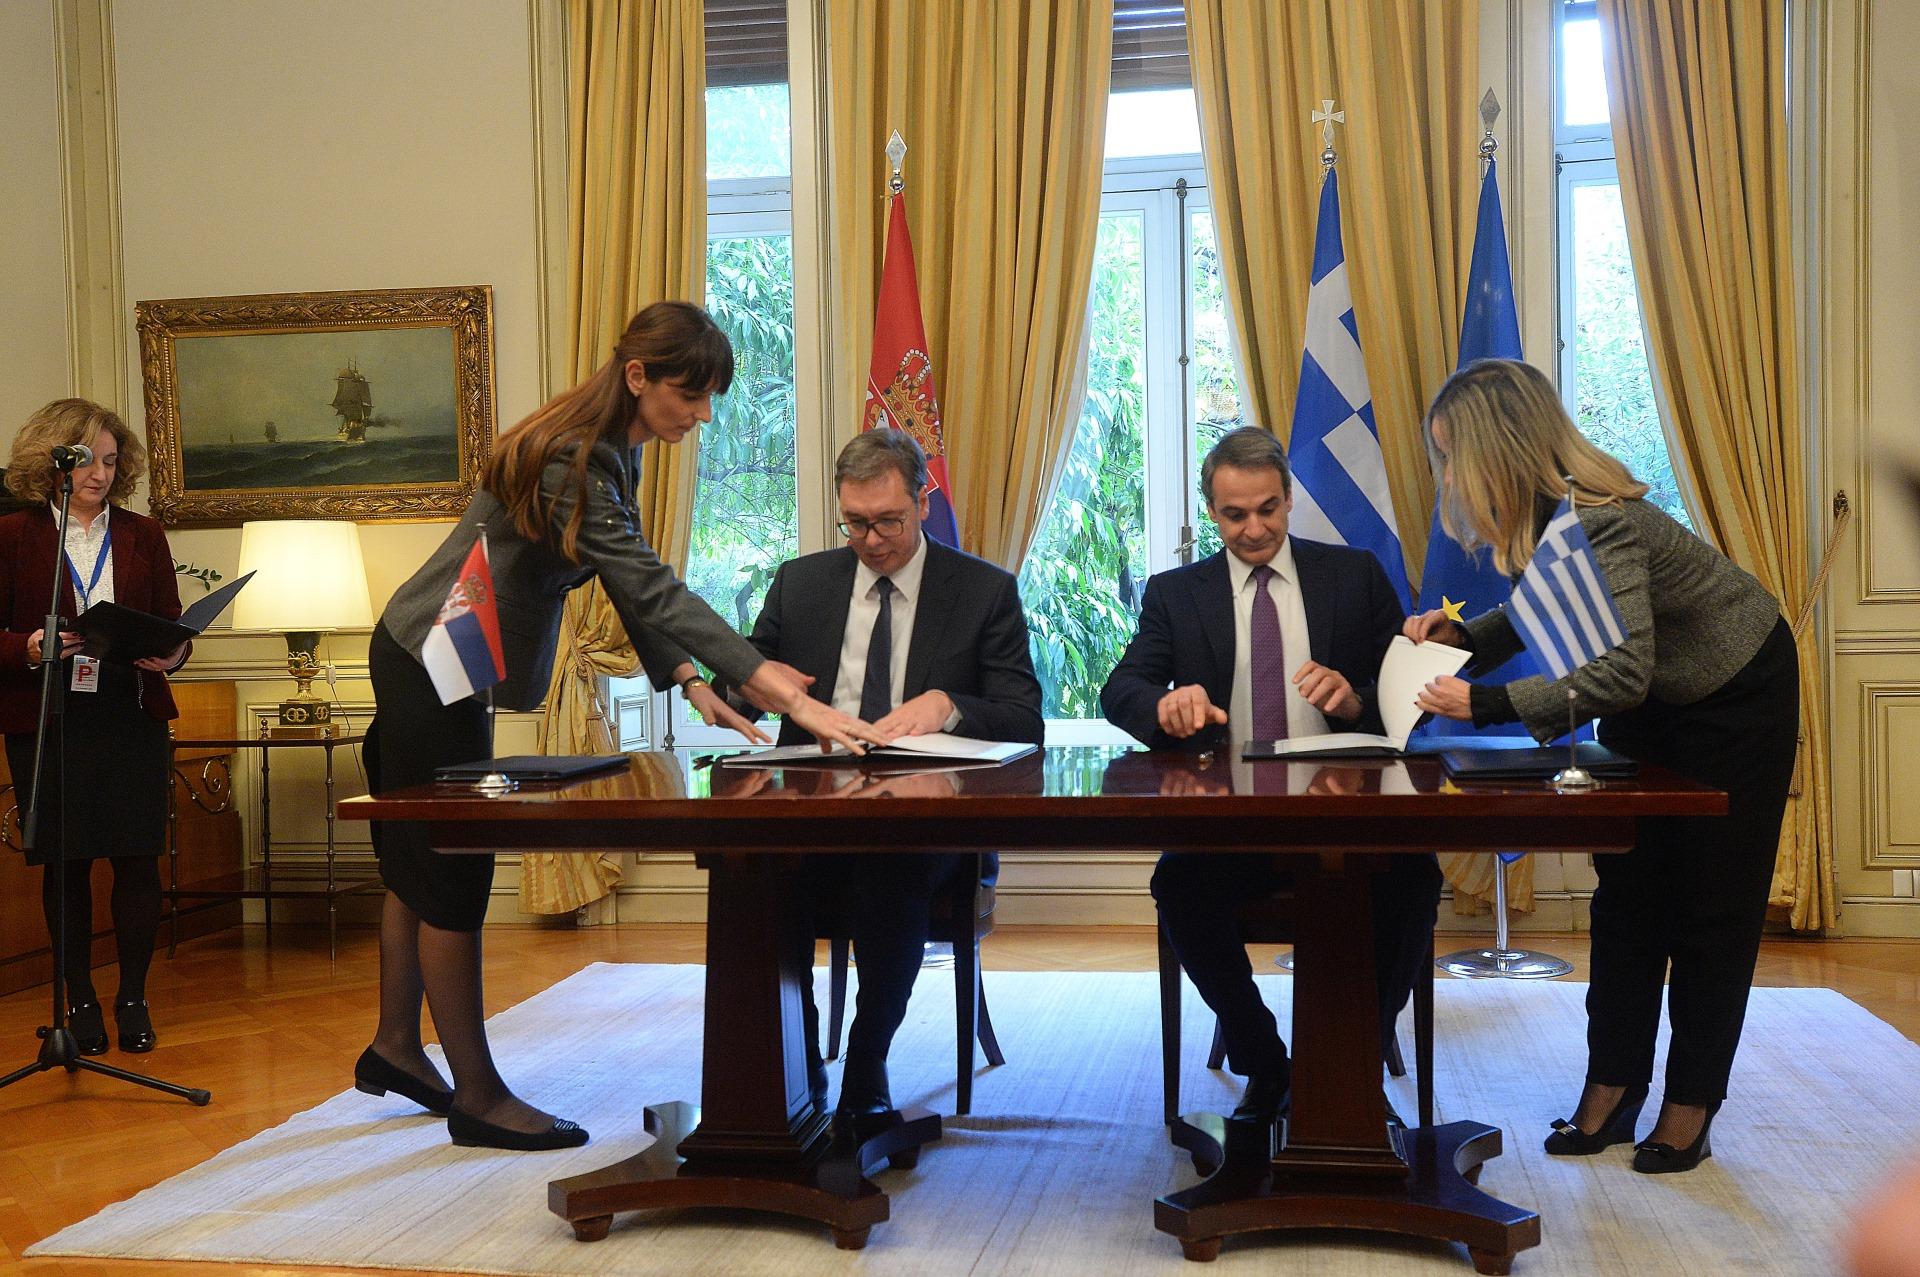 Predsednik Srbije Aleksandar Vucic sa grčkim premijerom Kirjakosom Micotakisom 2